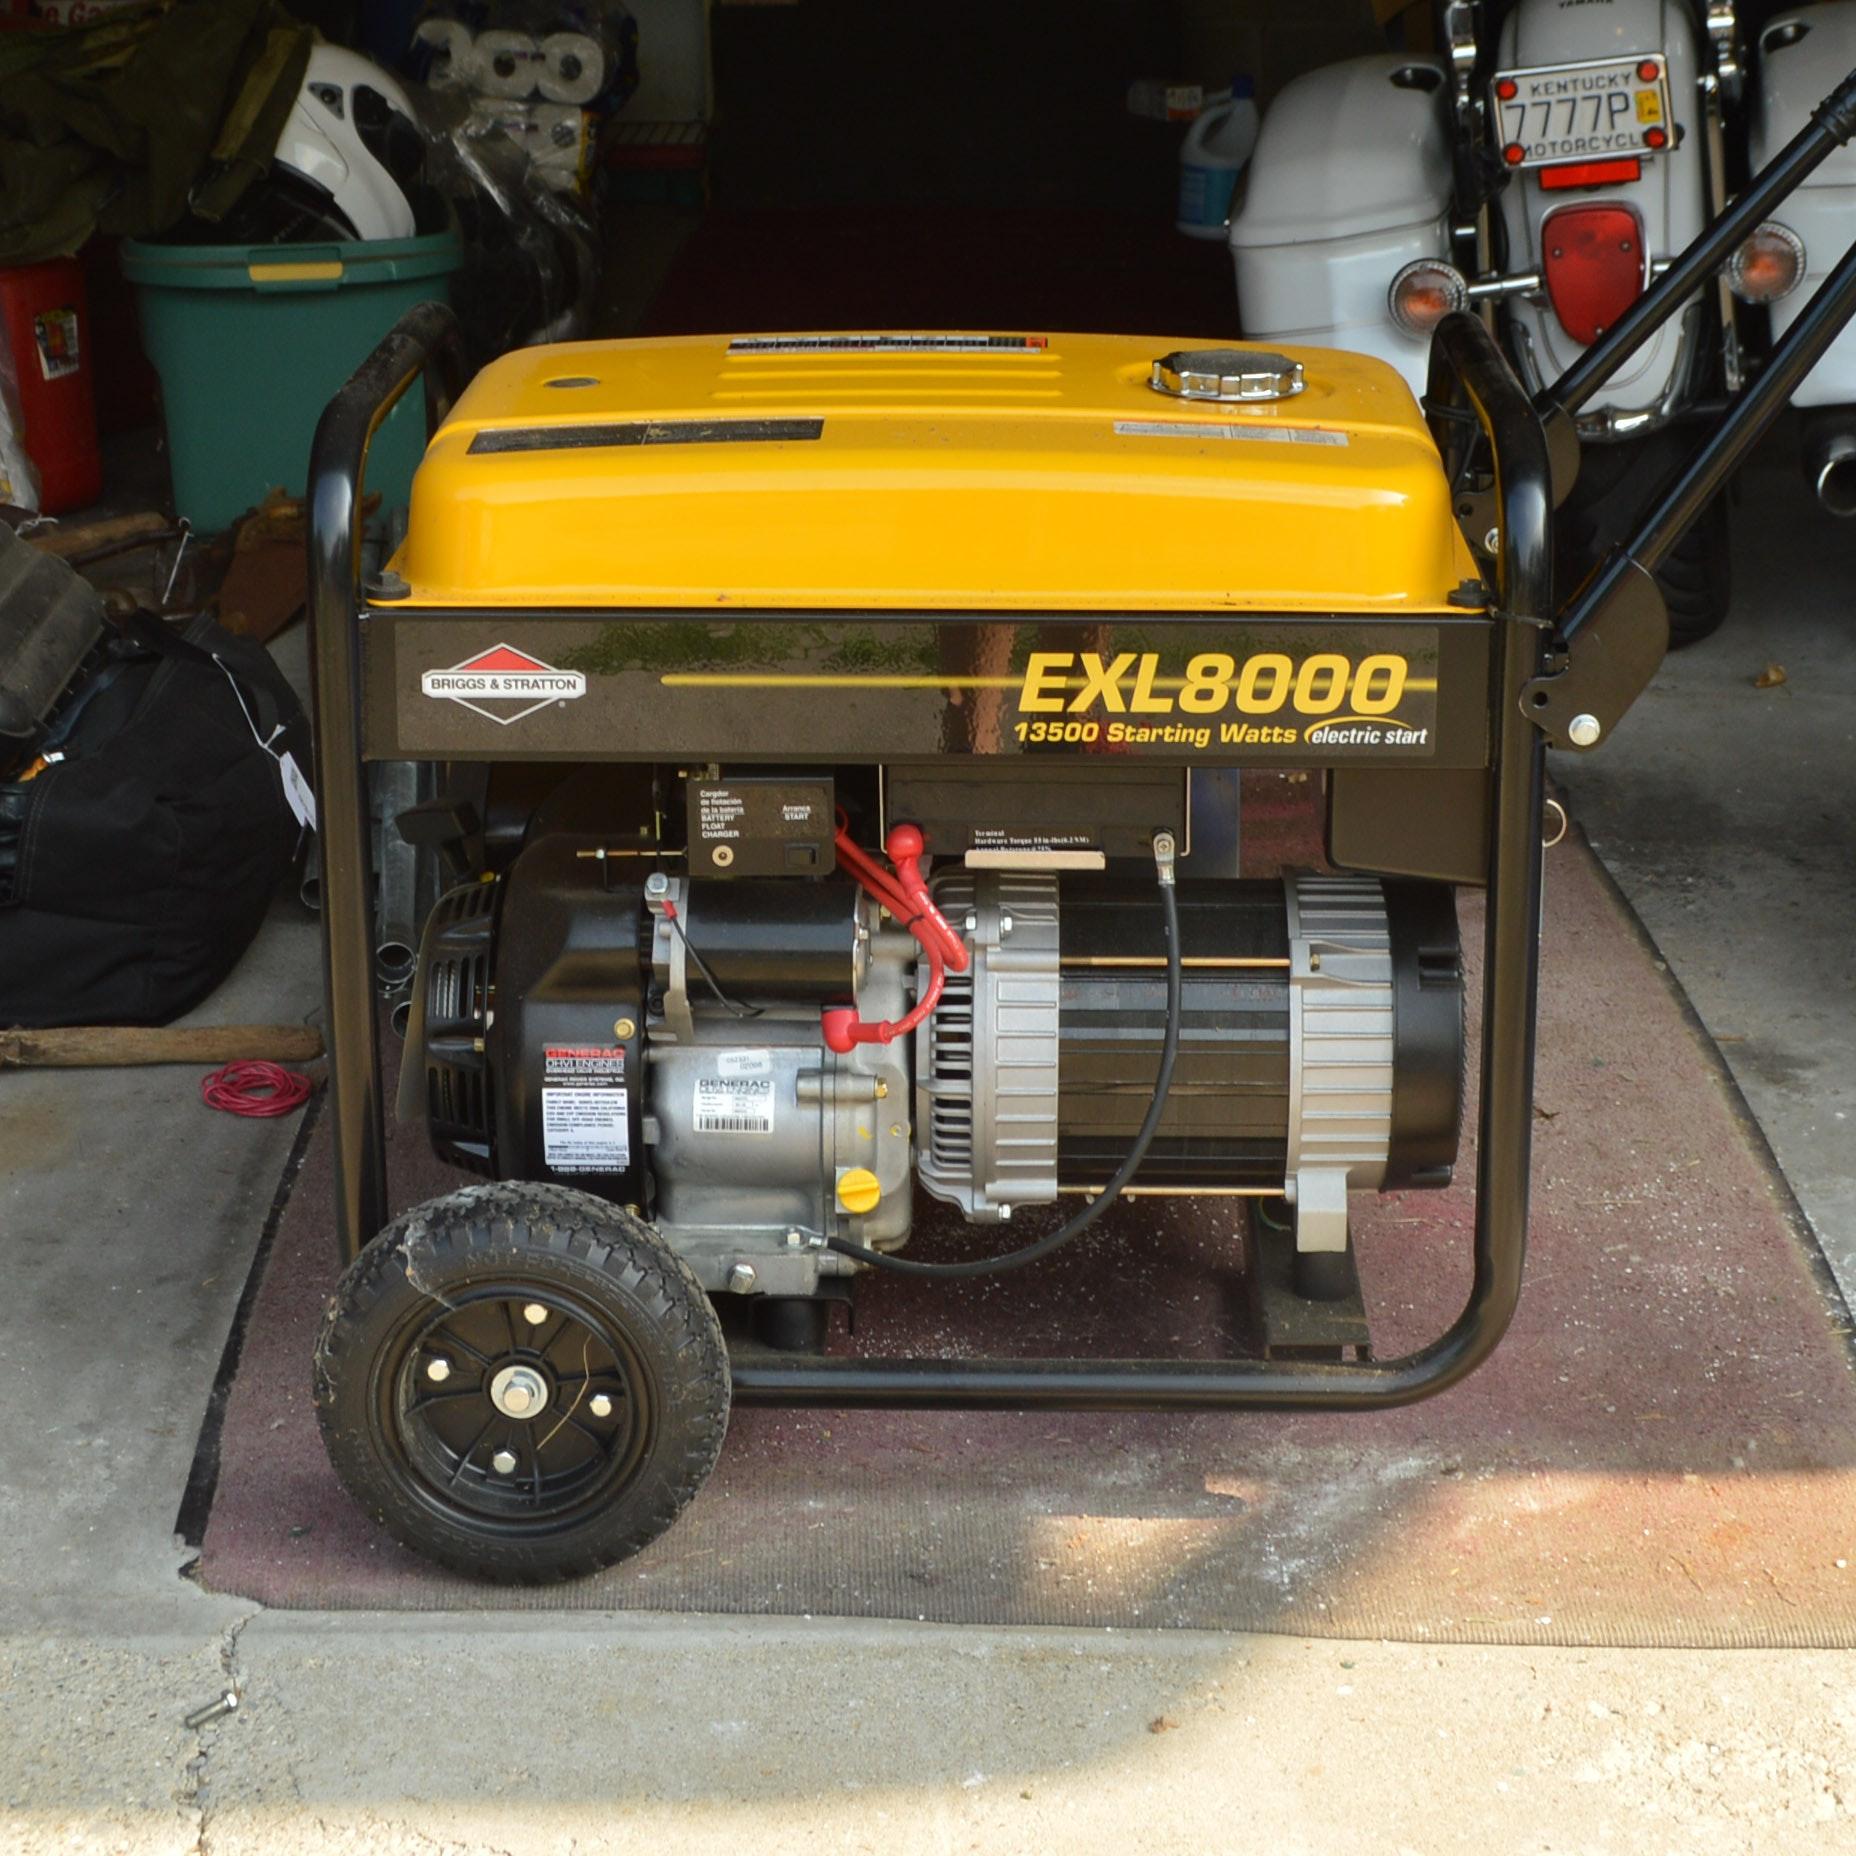 Briggs & Stratton EXL 8000 13,500 Gas Powered Generator